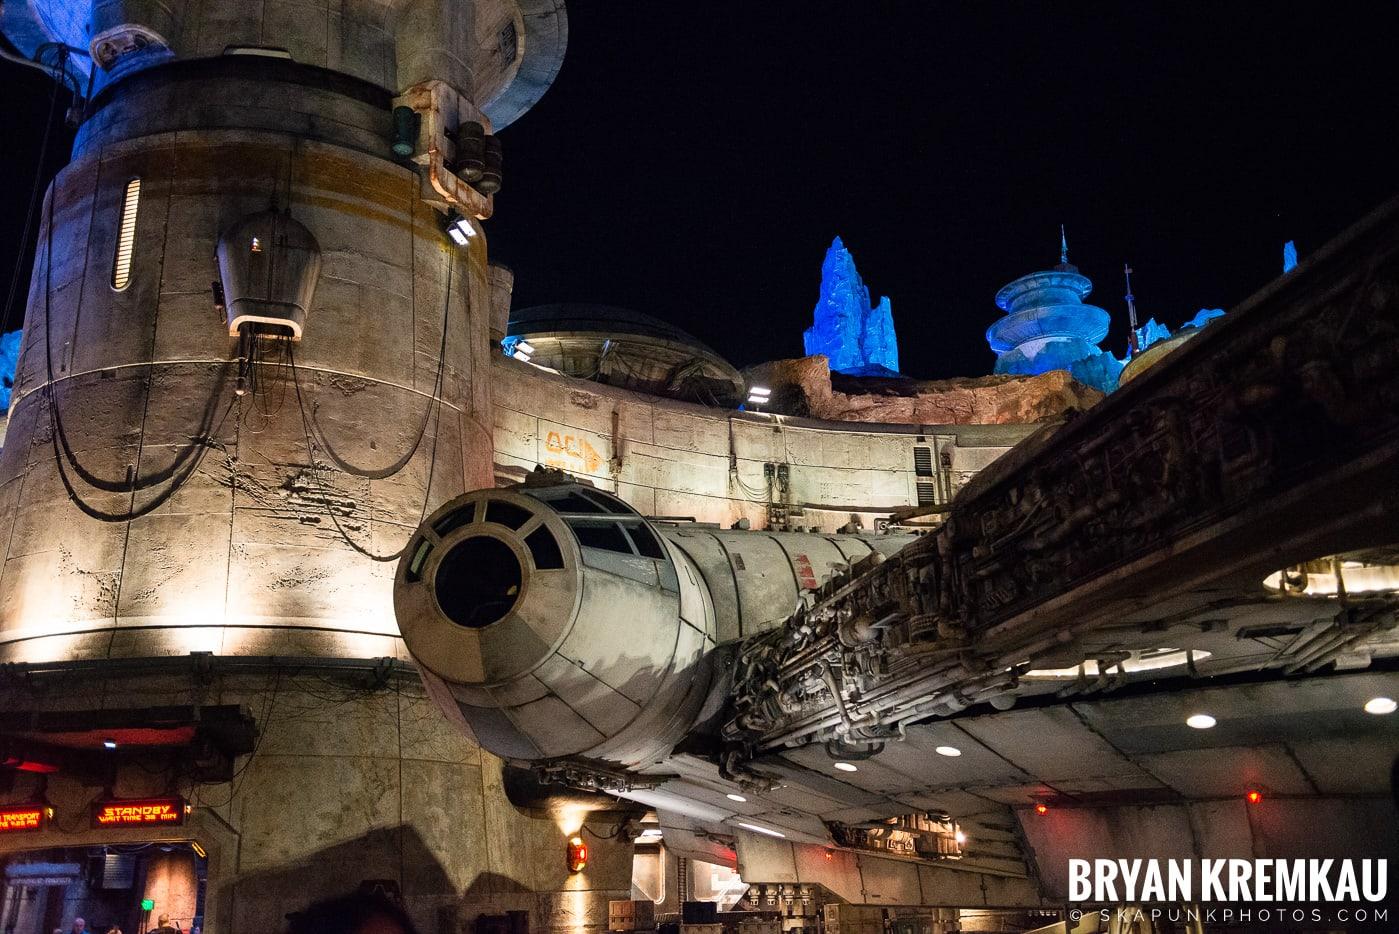 Walt Disney World Vacation: Day 5 (Animal Kingdom / Disney's Hollywood Studios) - 10.3.19 (17)